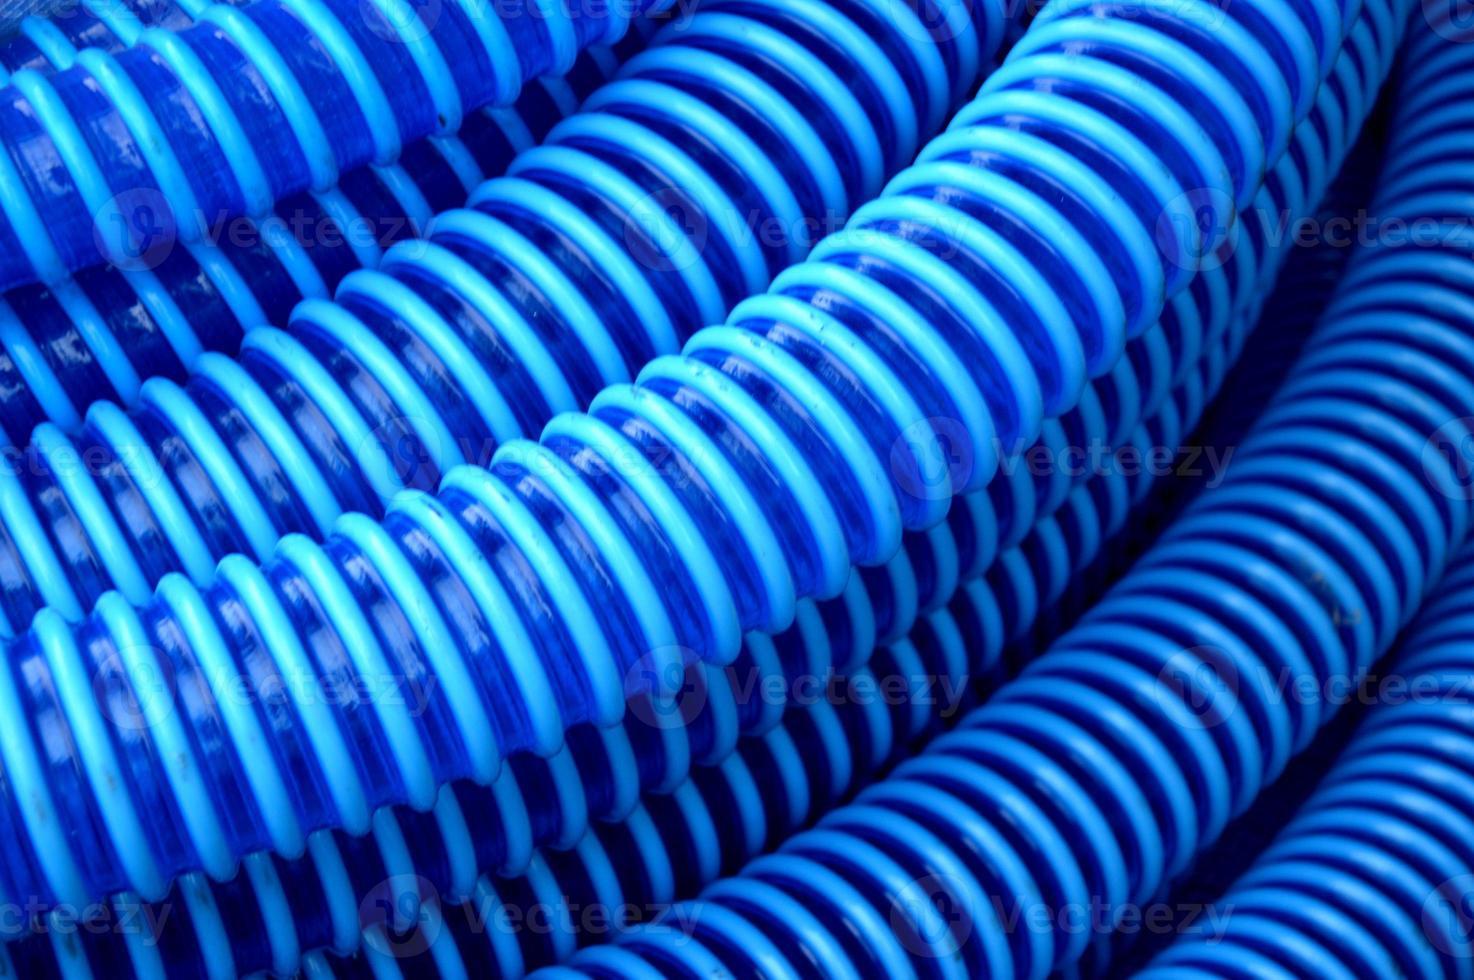 blauwe plastic slang achtergrond foto